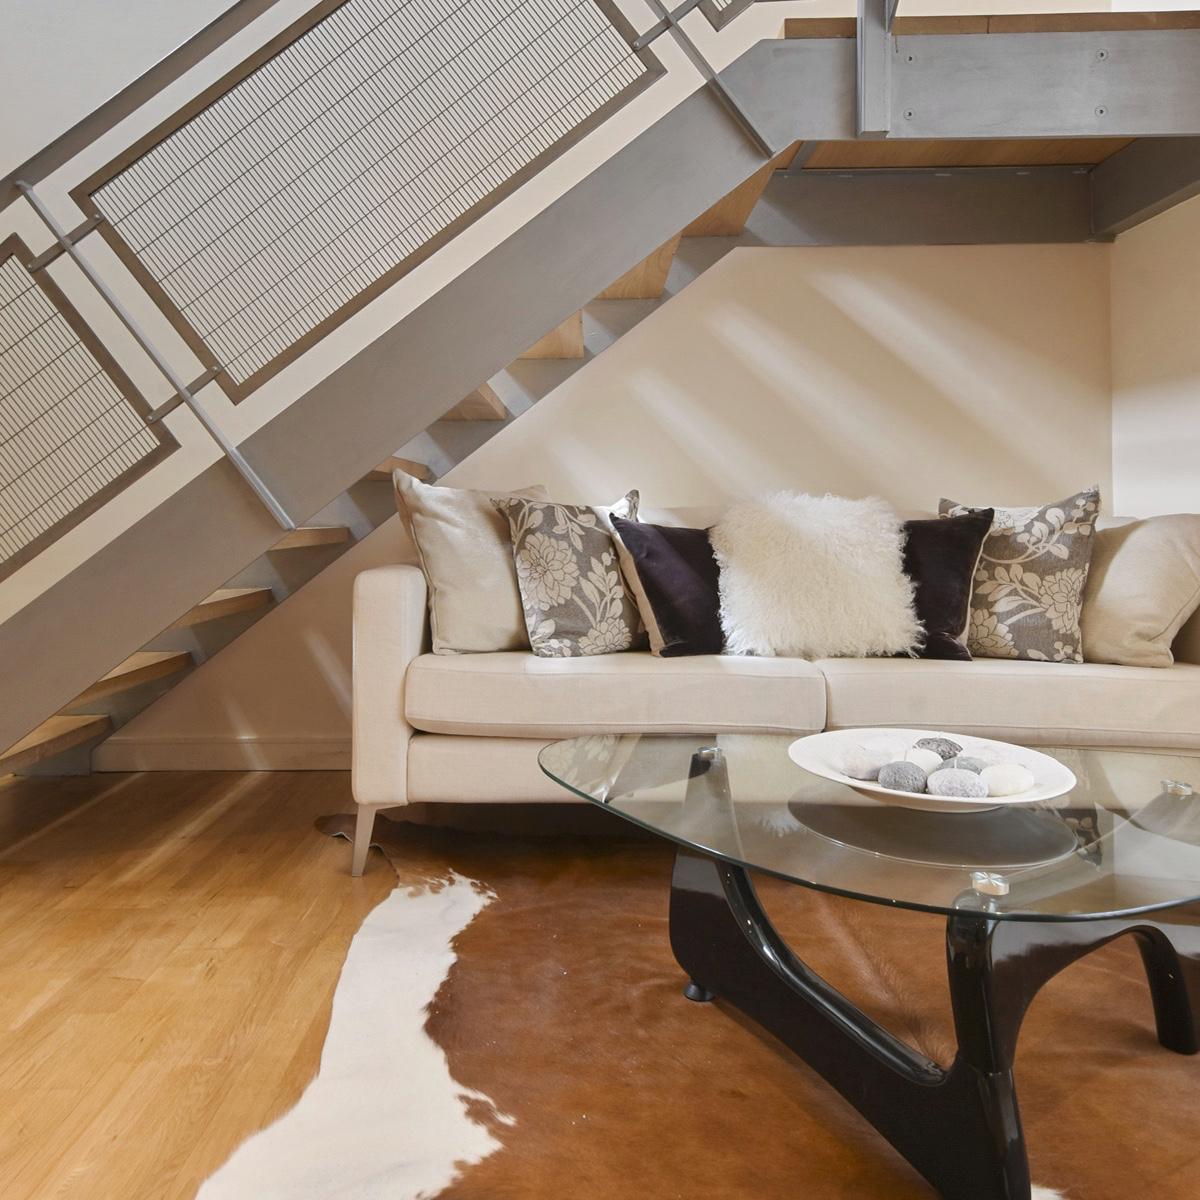 Islington maisonette sofa and coffee table